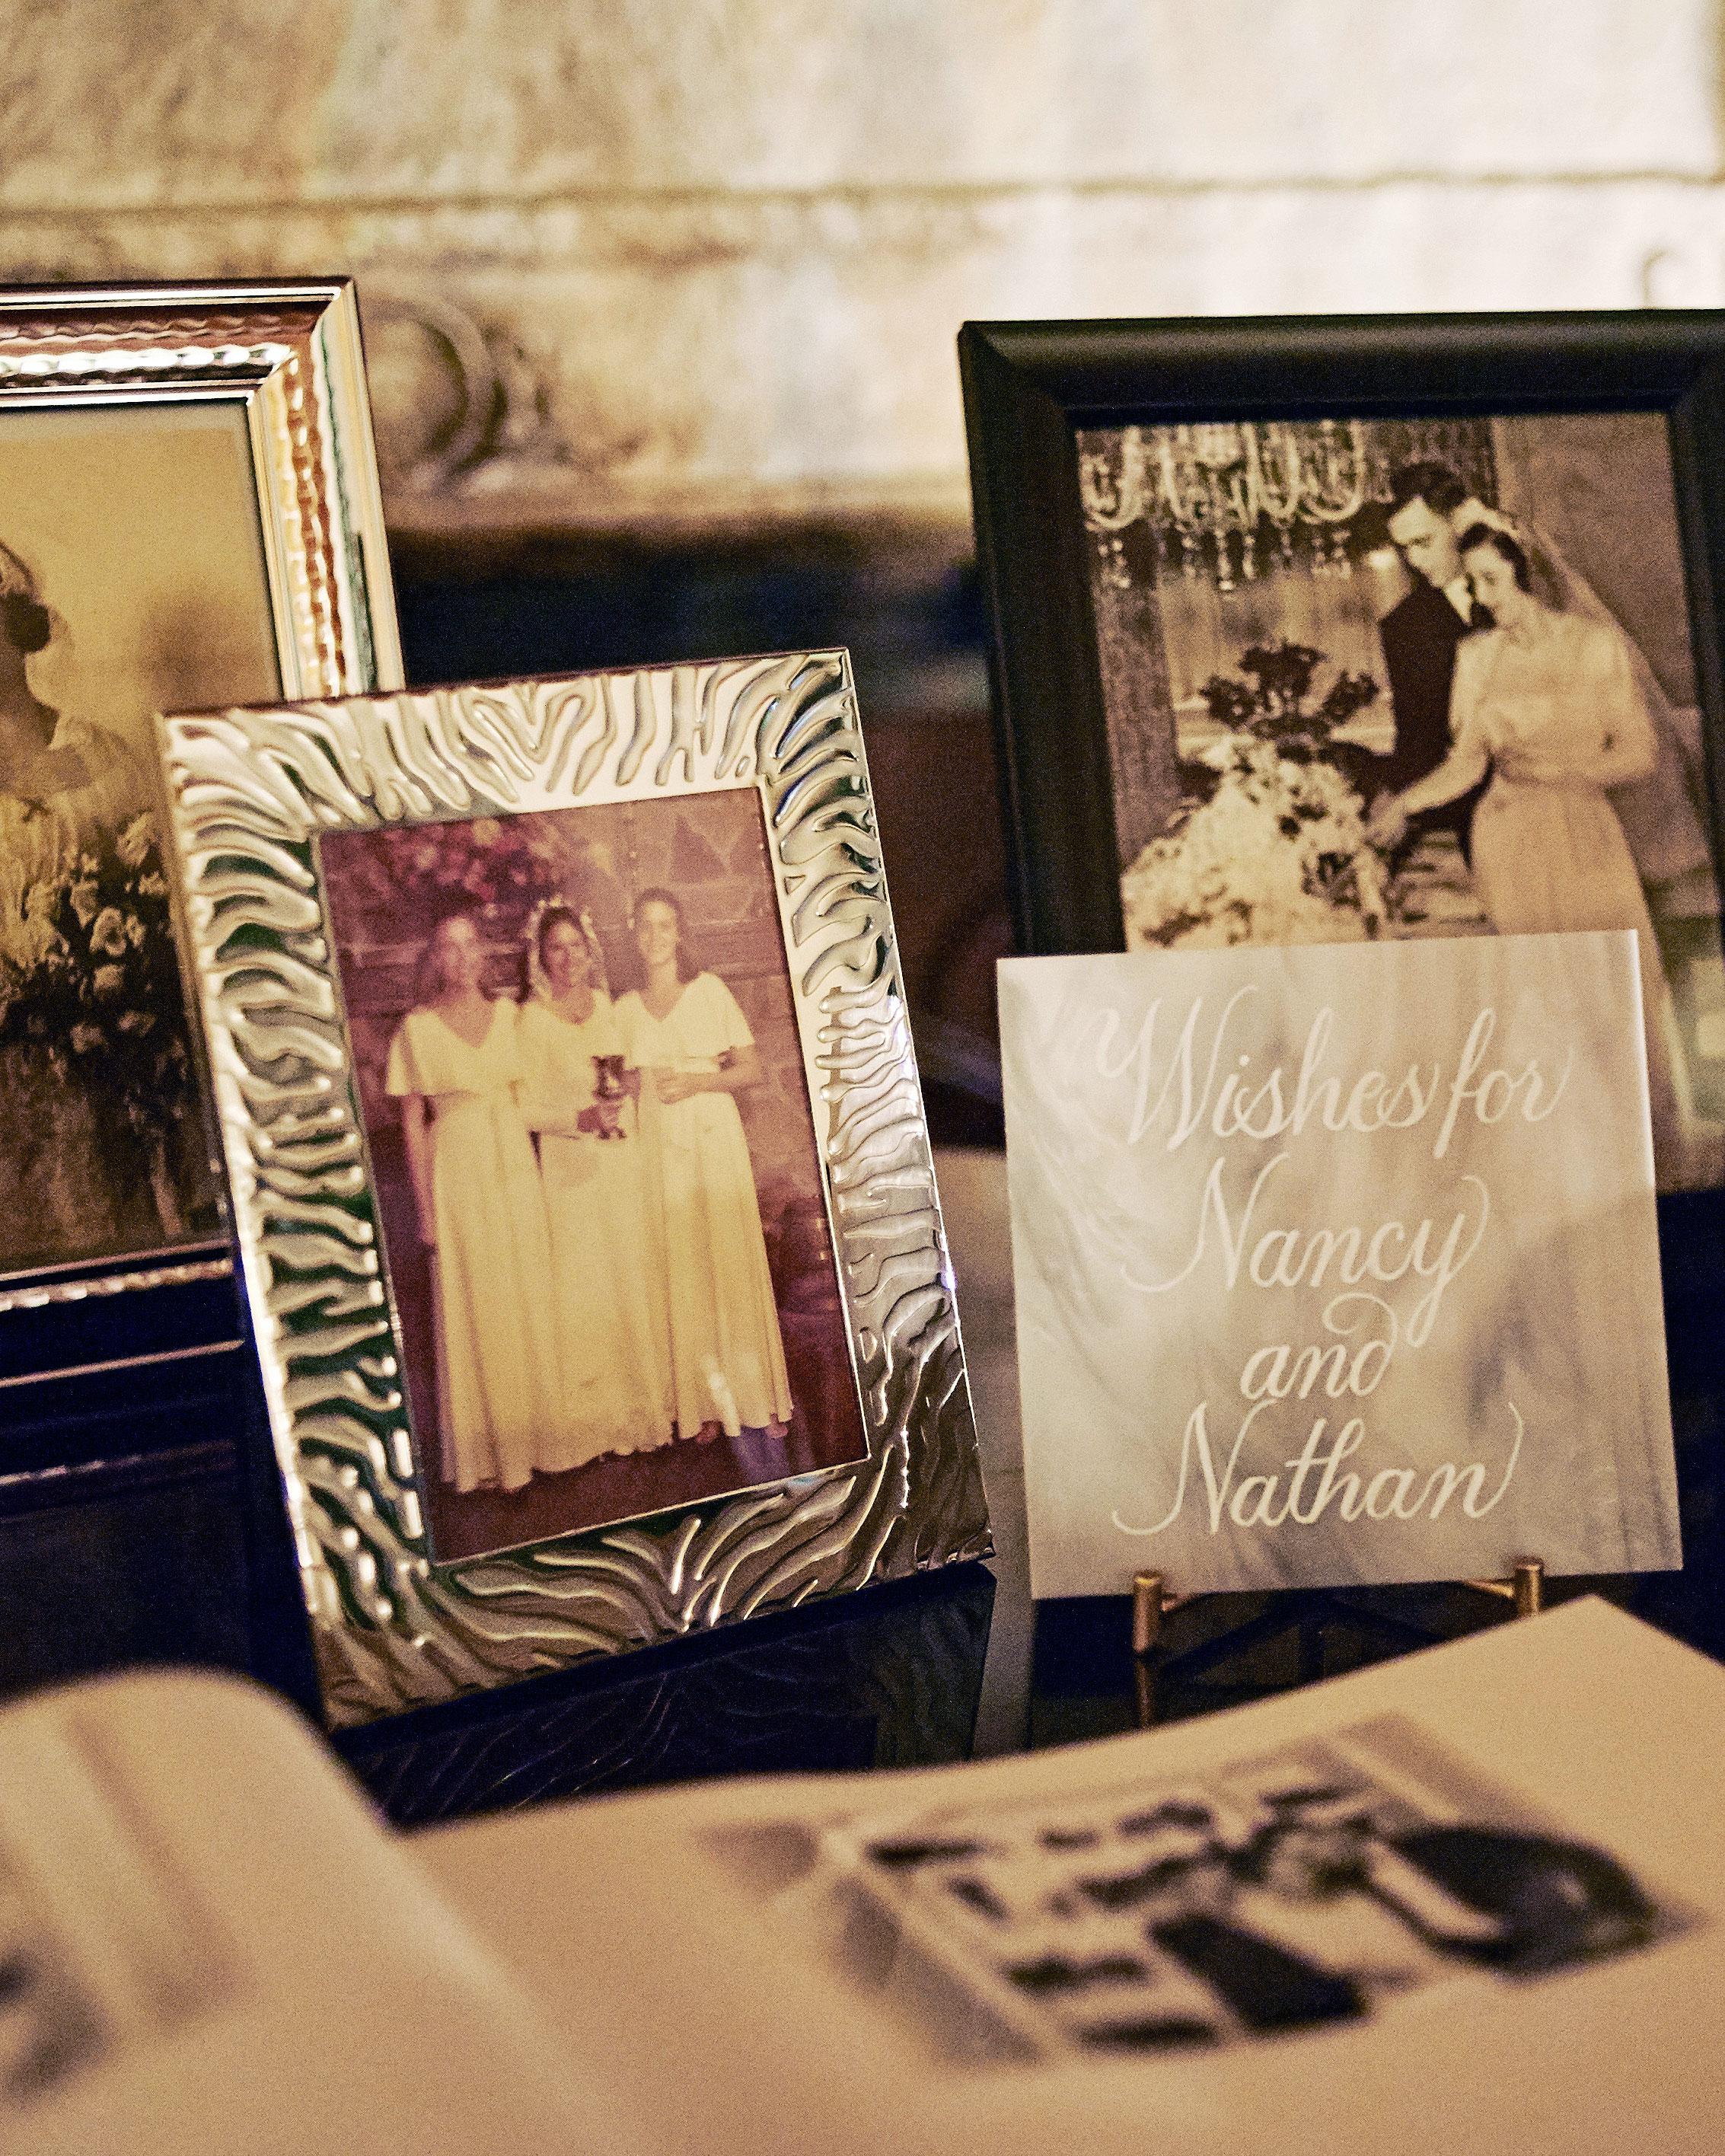 nancy-nathan-wedding-guestbook-1175-6141569-0816.jpg